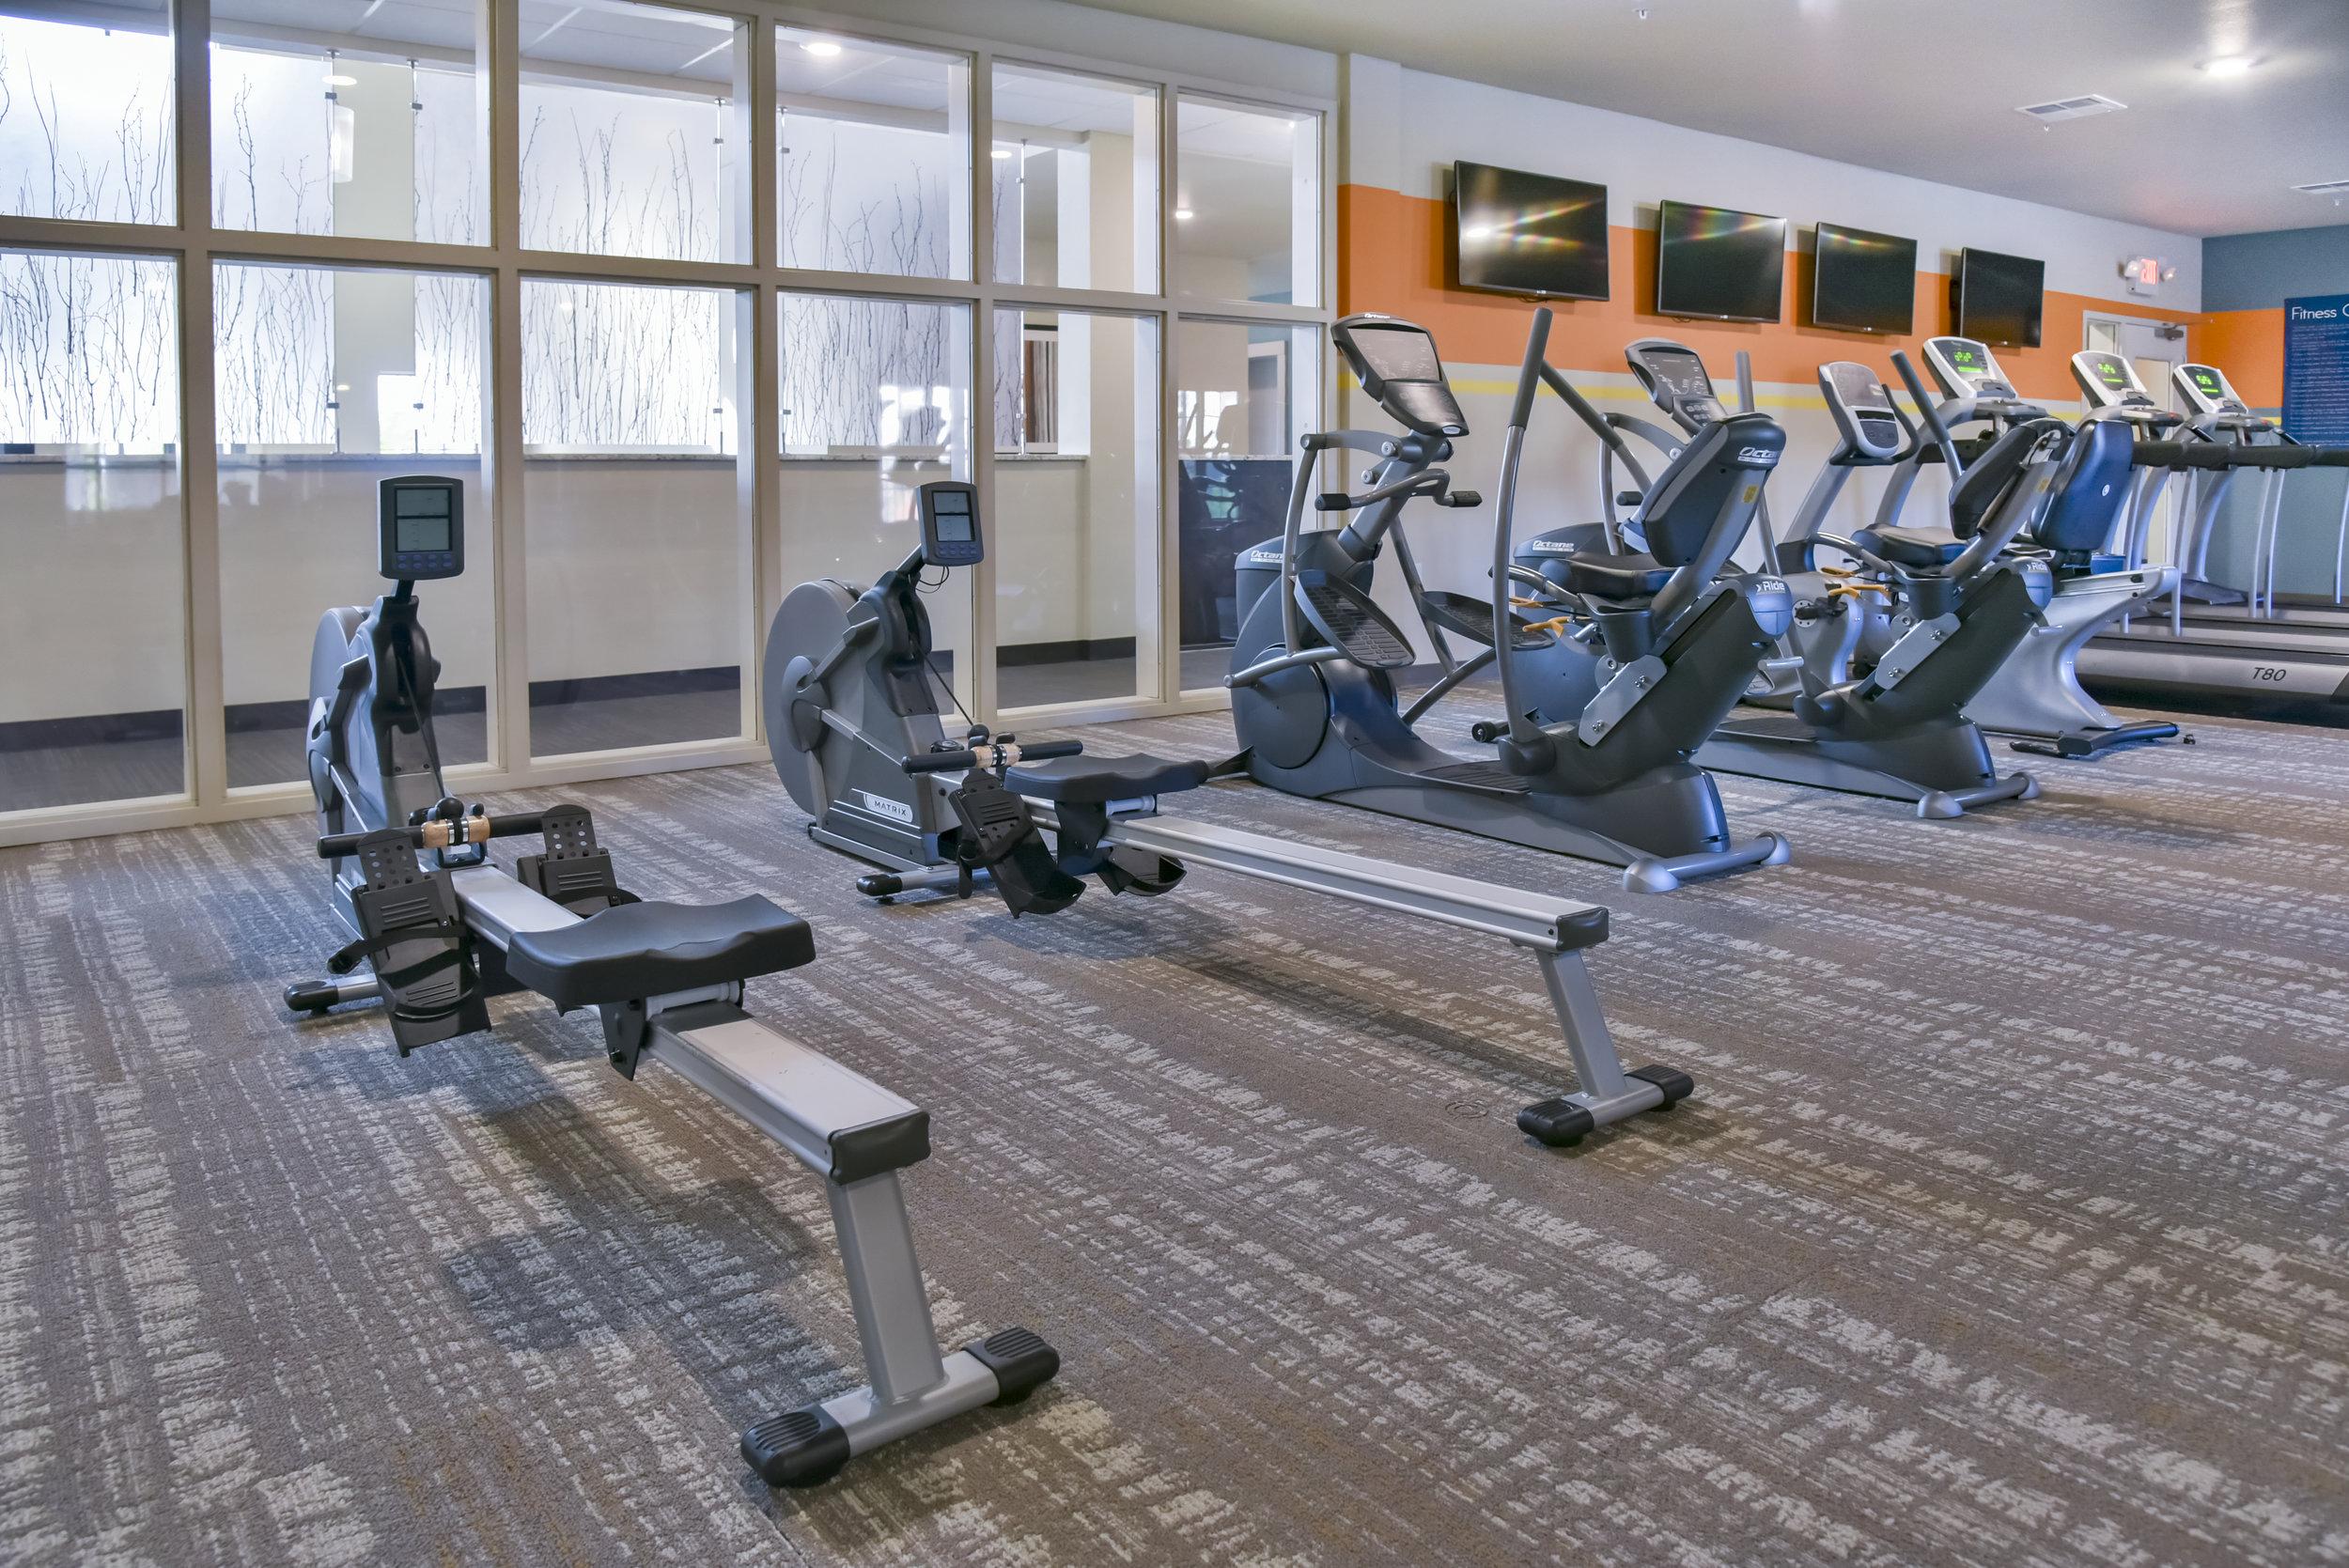 14 Fitness Center with Cardio _ Strength Equipment.jpg